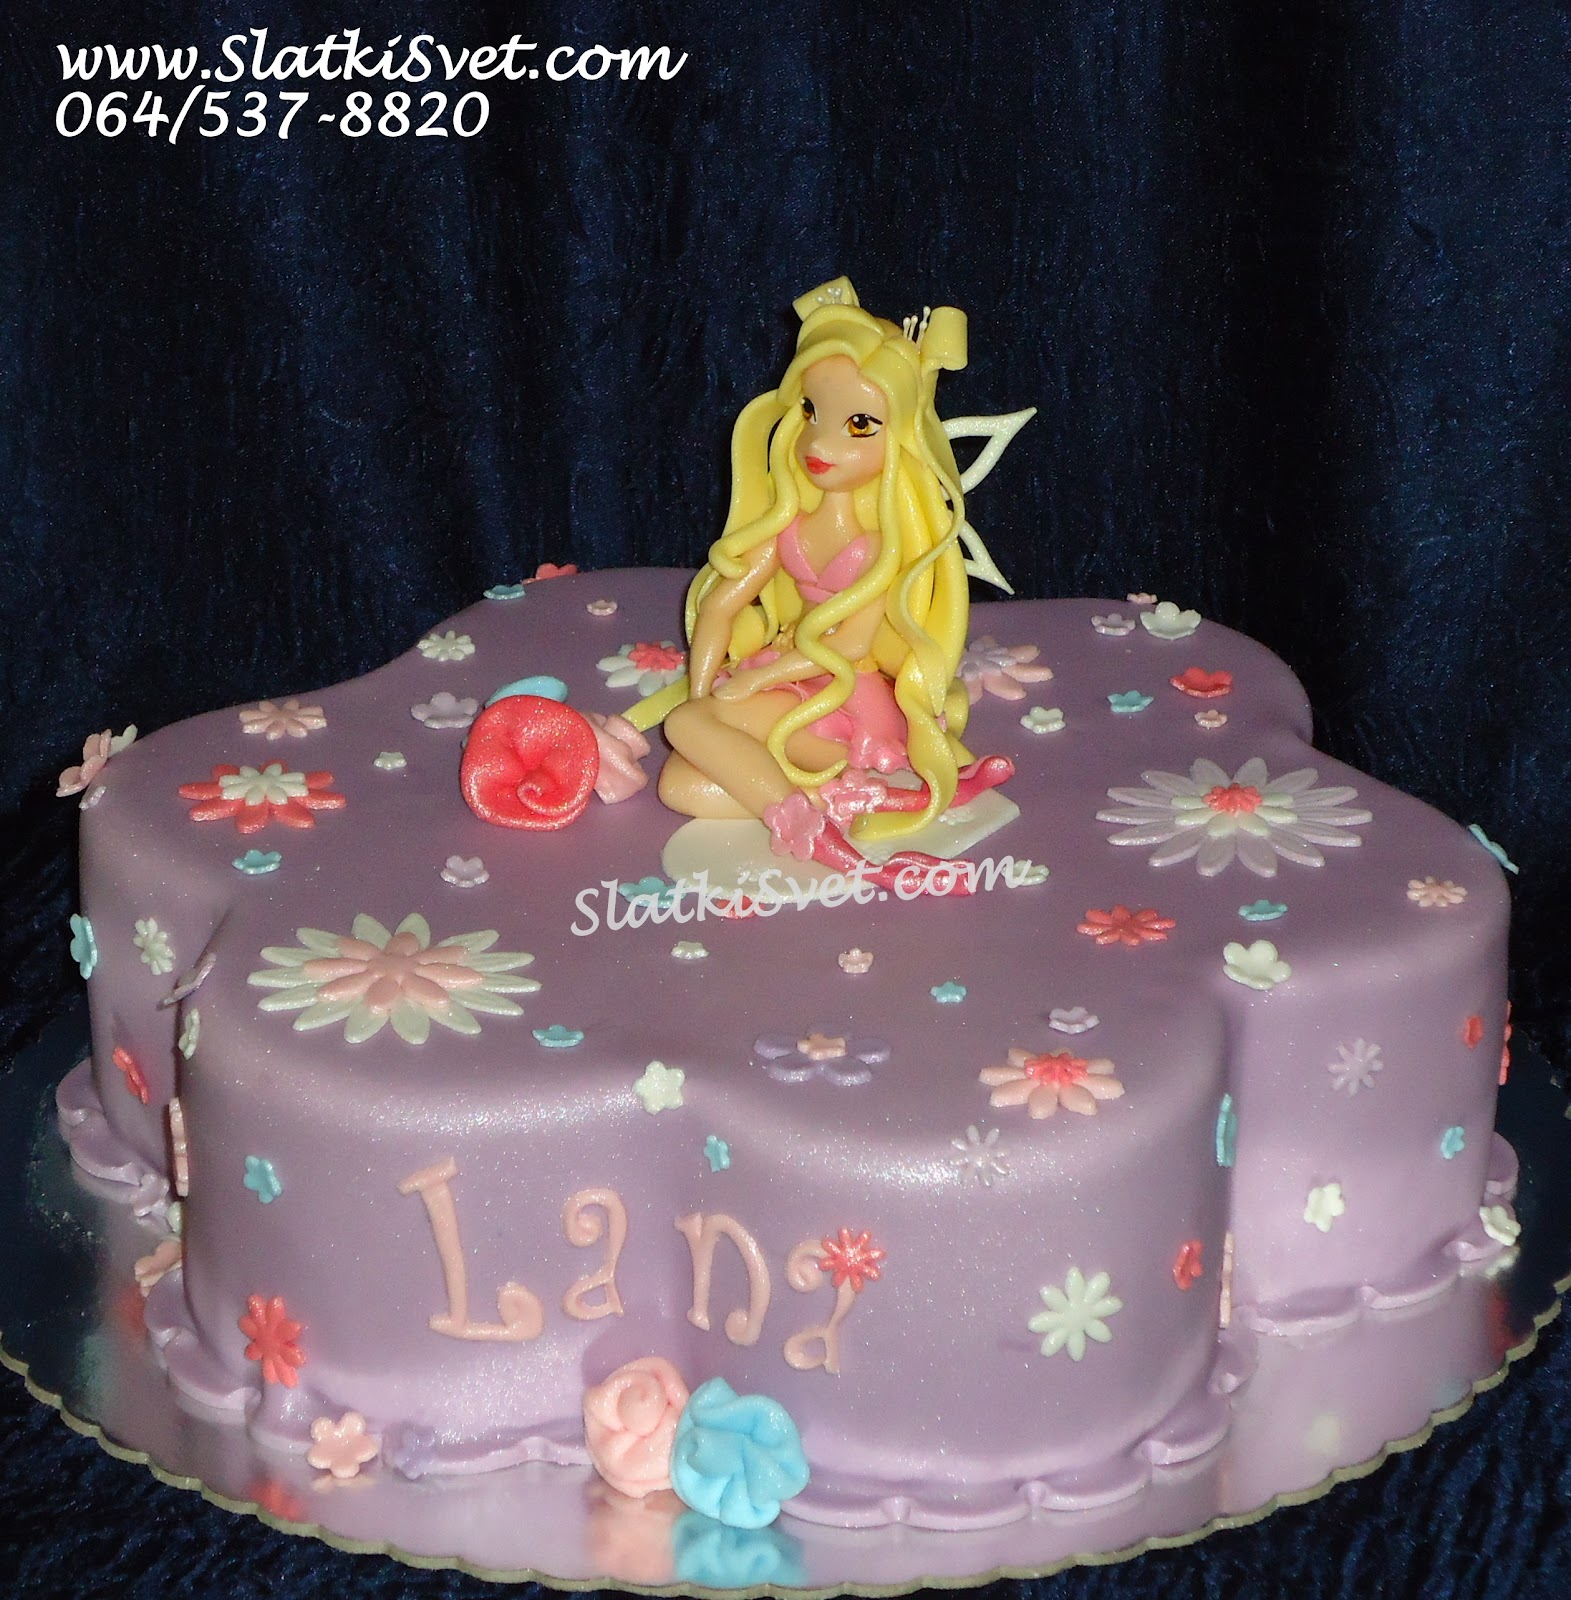 Decije Rodjendanske Torte: Torta Vinx Vila - Torte za devojcice